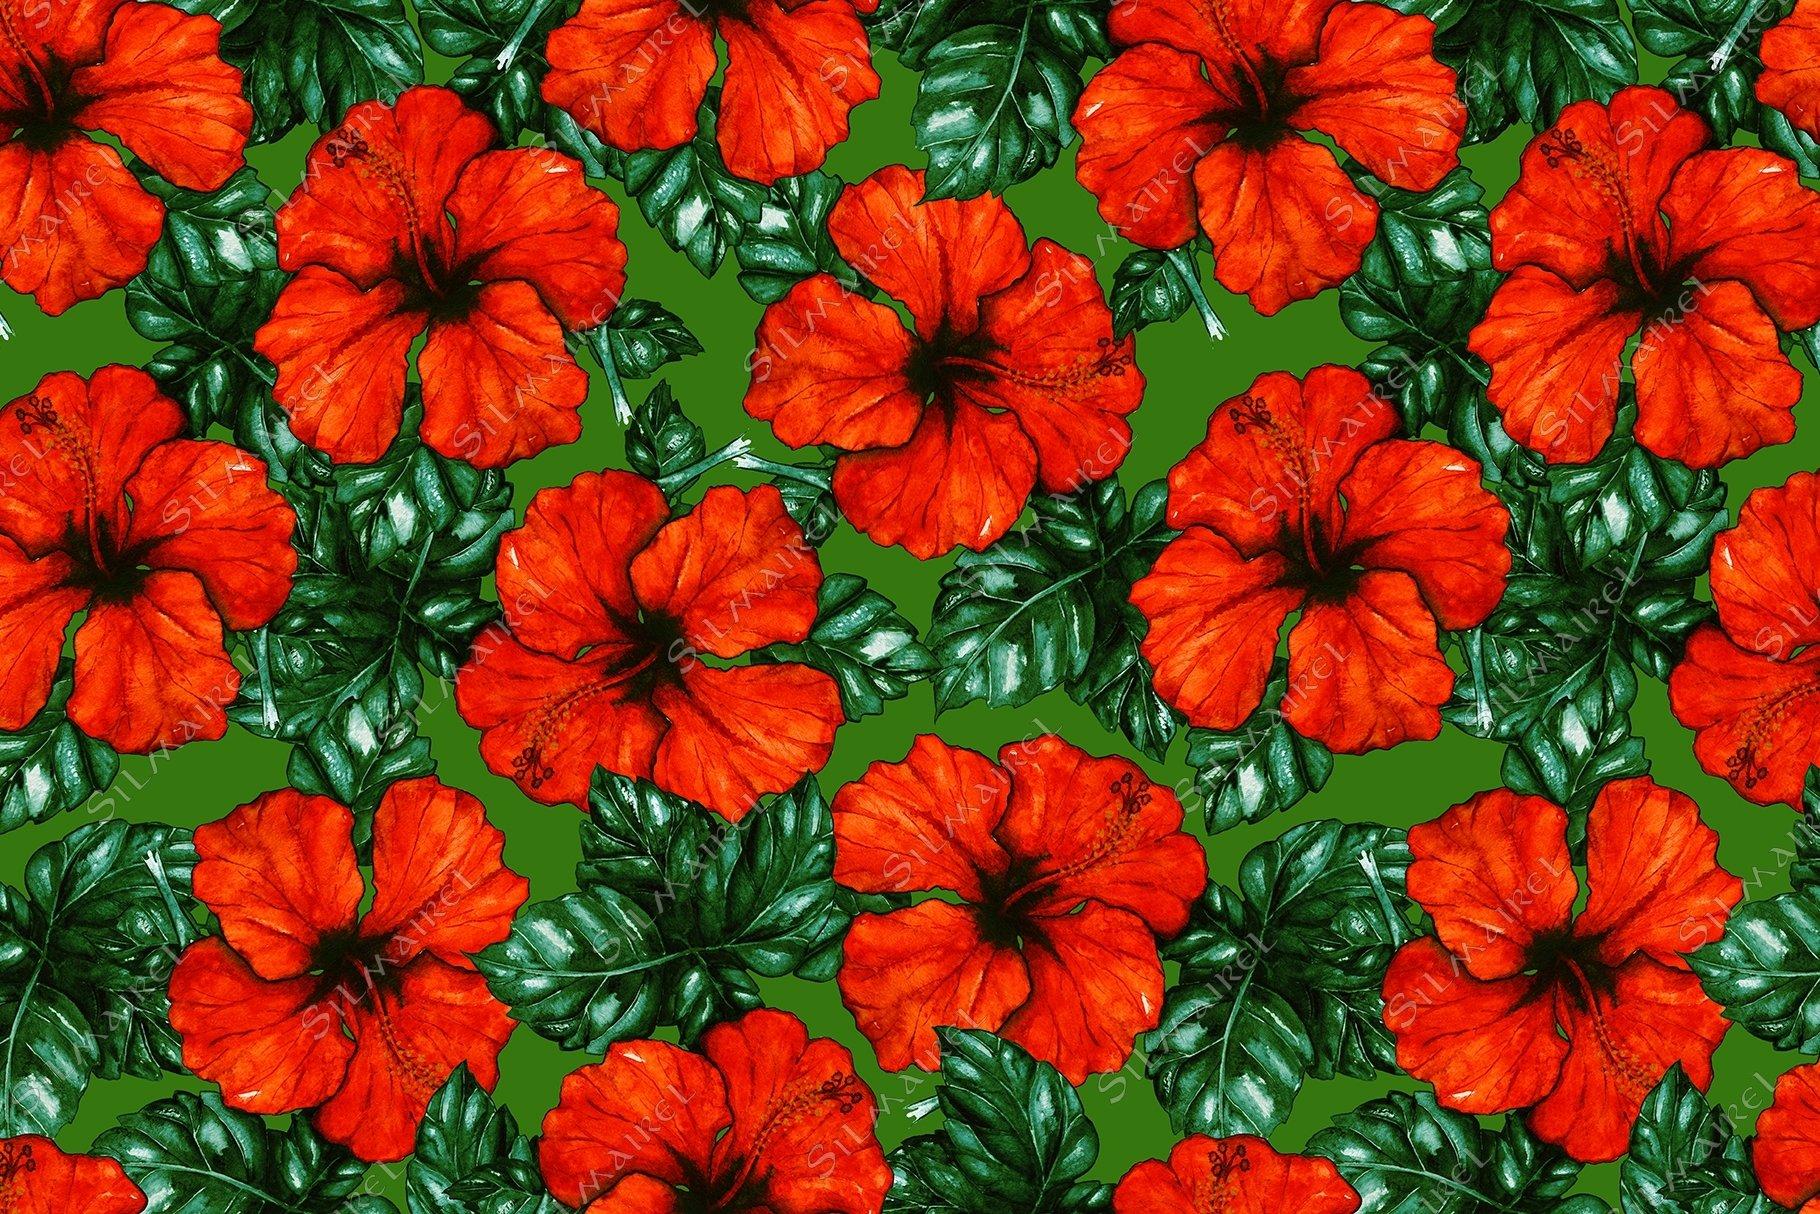 Watercolor red hibiscus karkade flower seamless pattern example image 1